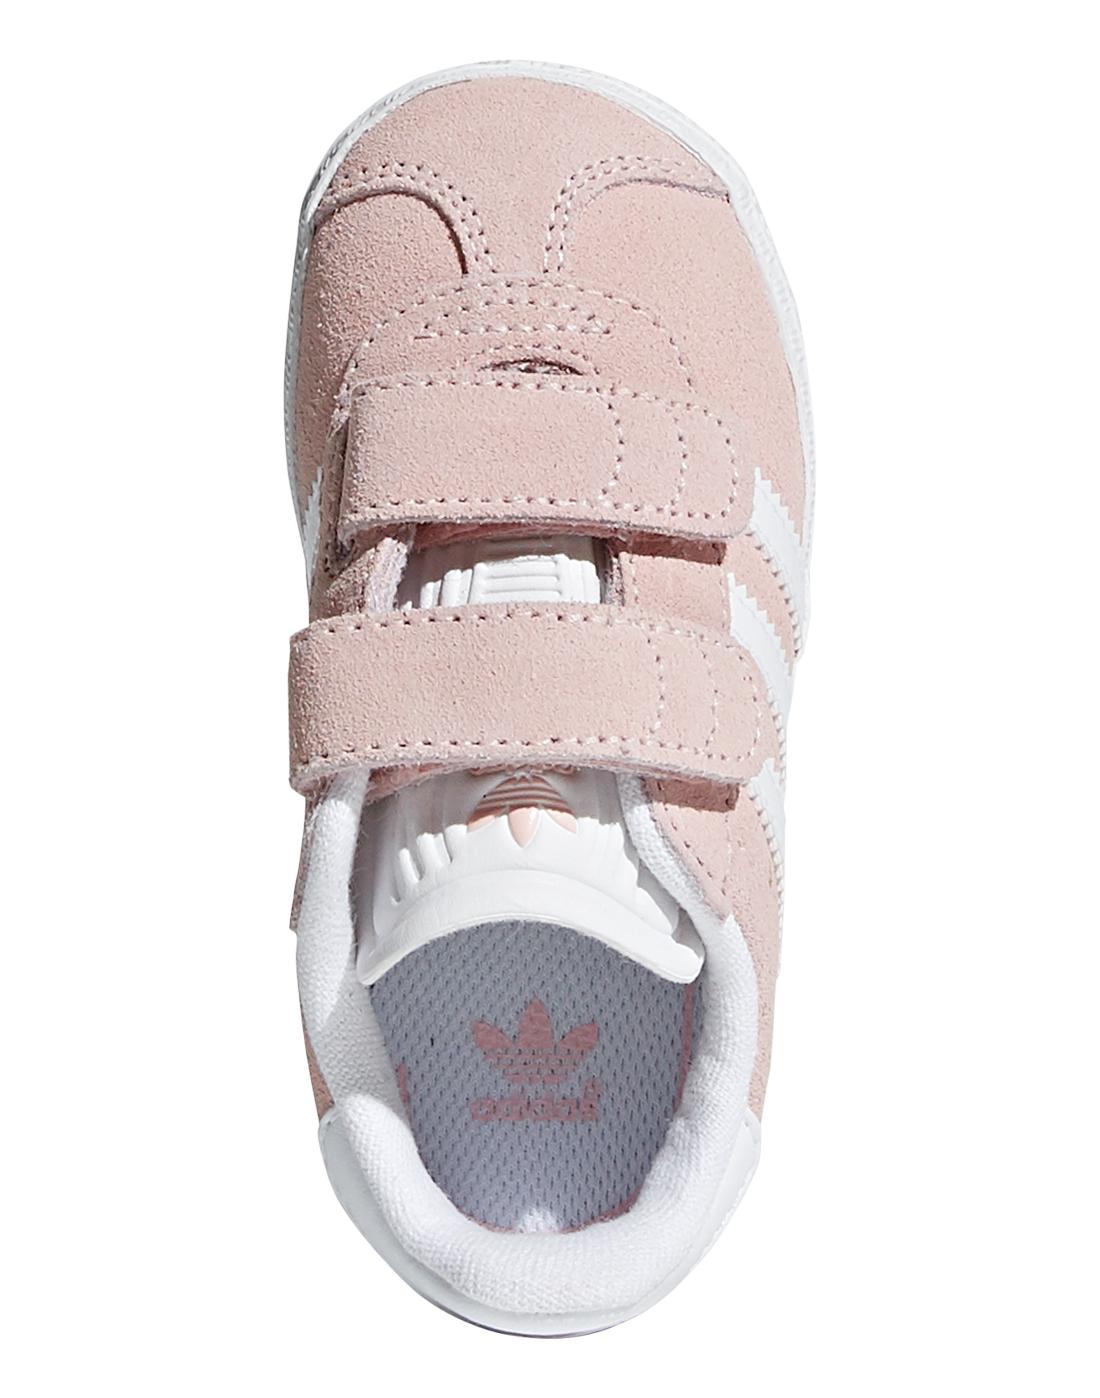 d36f3208adeb85 adidas Originals. Infant Girls Gazelle. Infant Girls Gazelle · Infant Girls  Gazelle · Infant Girls Gazelle